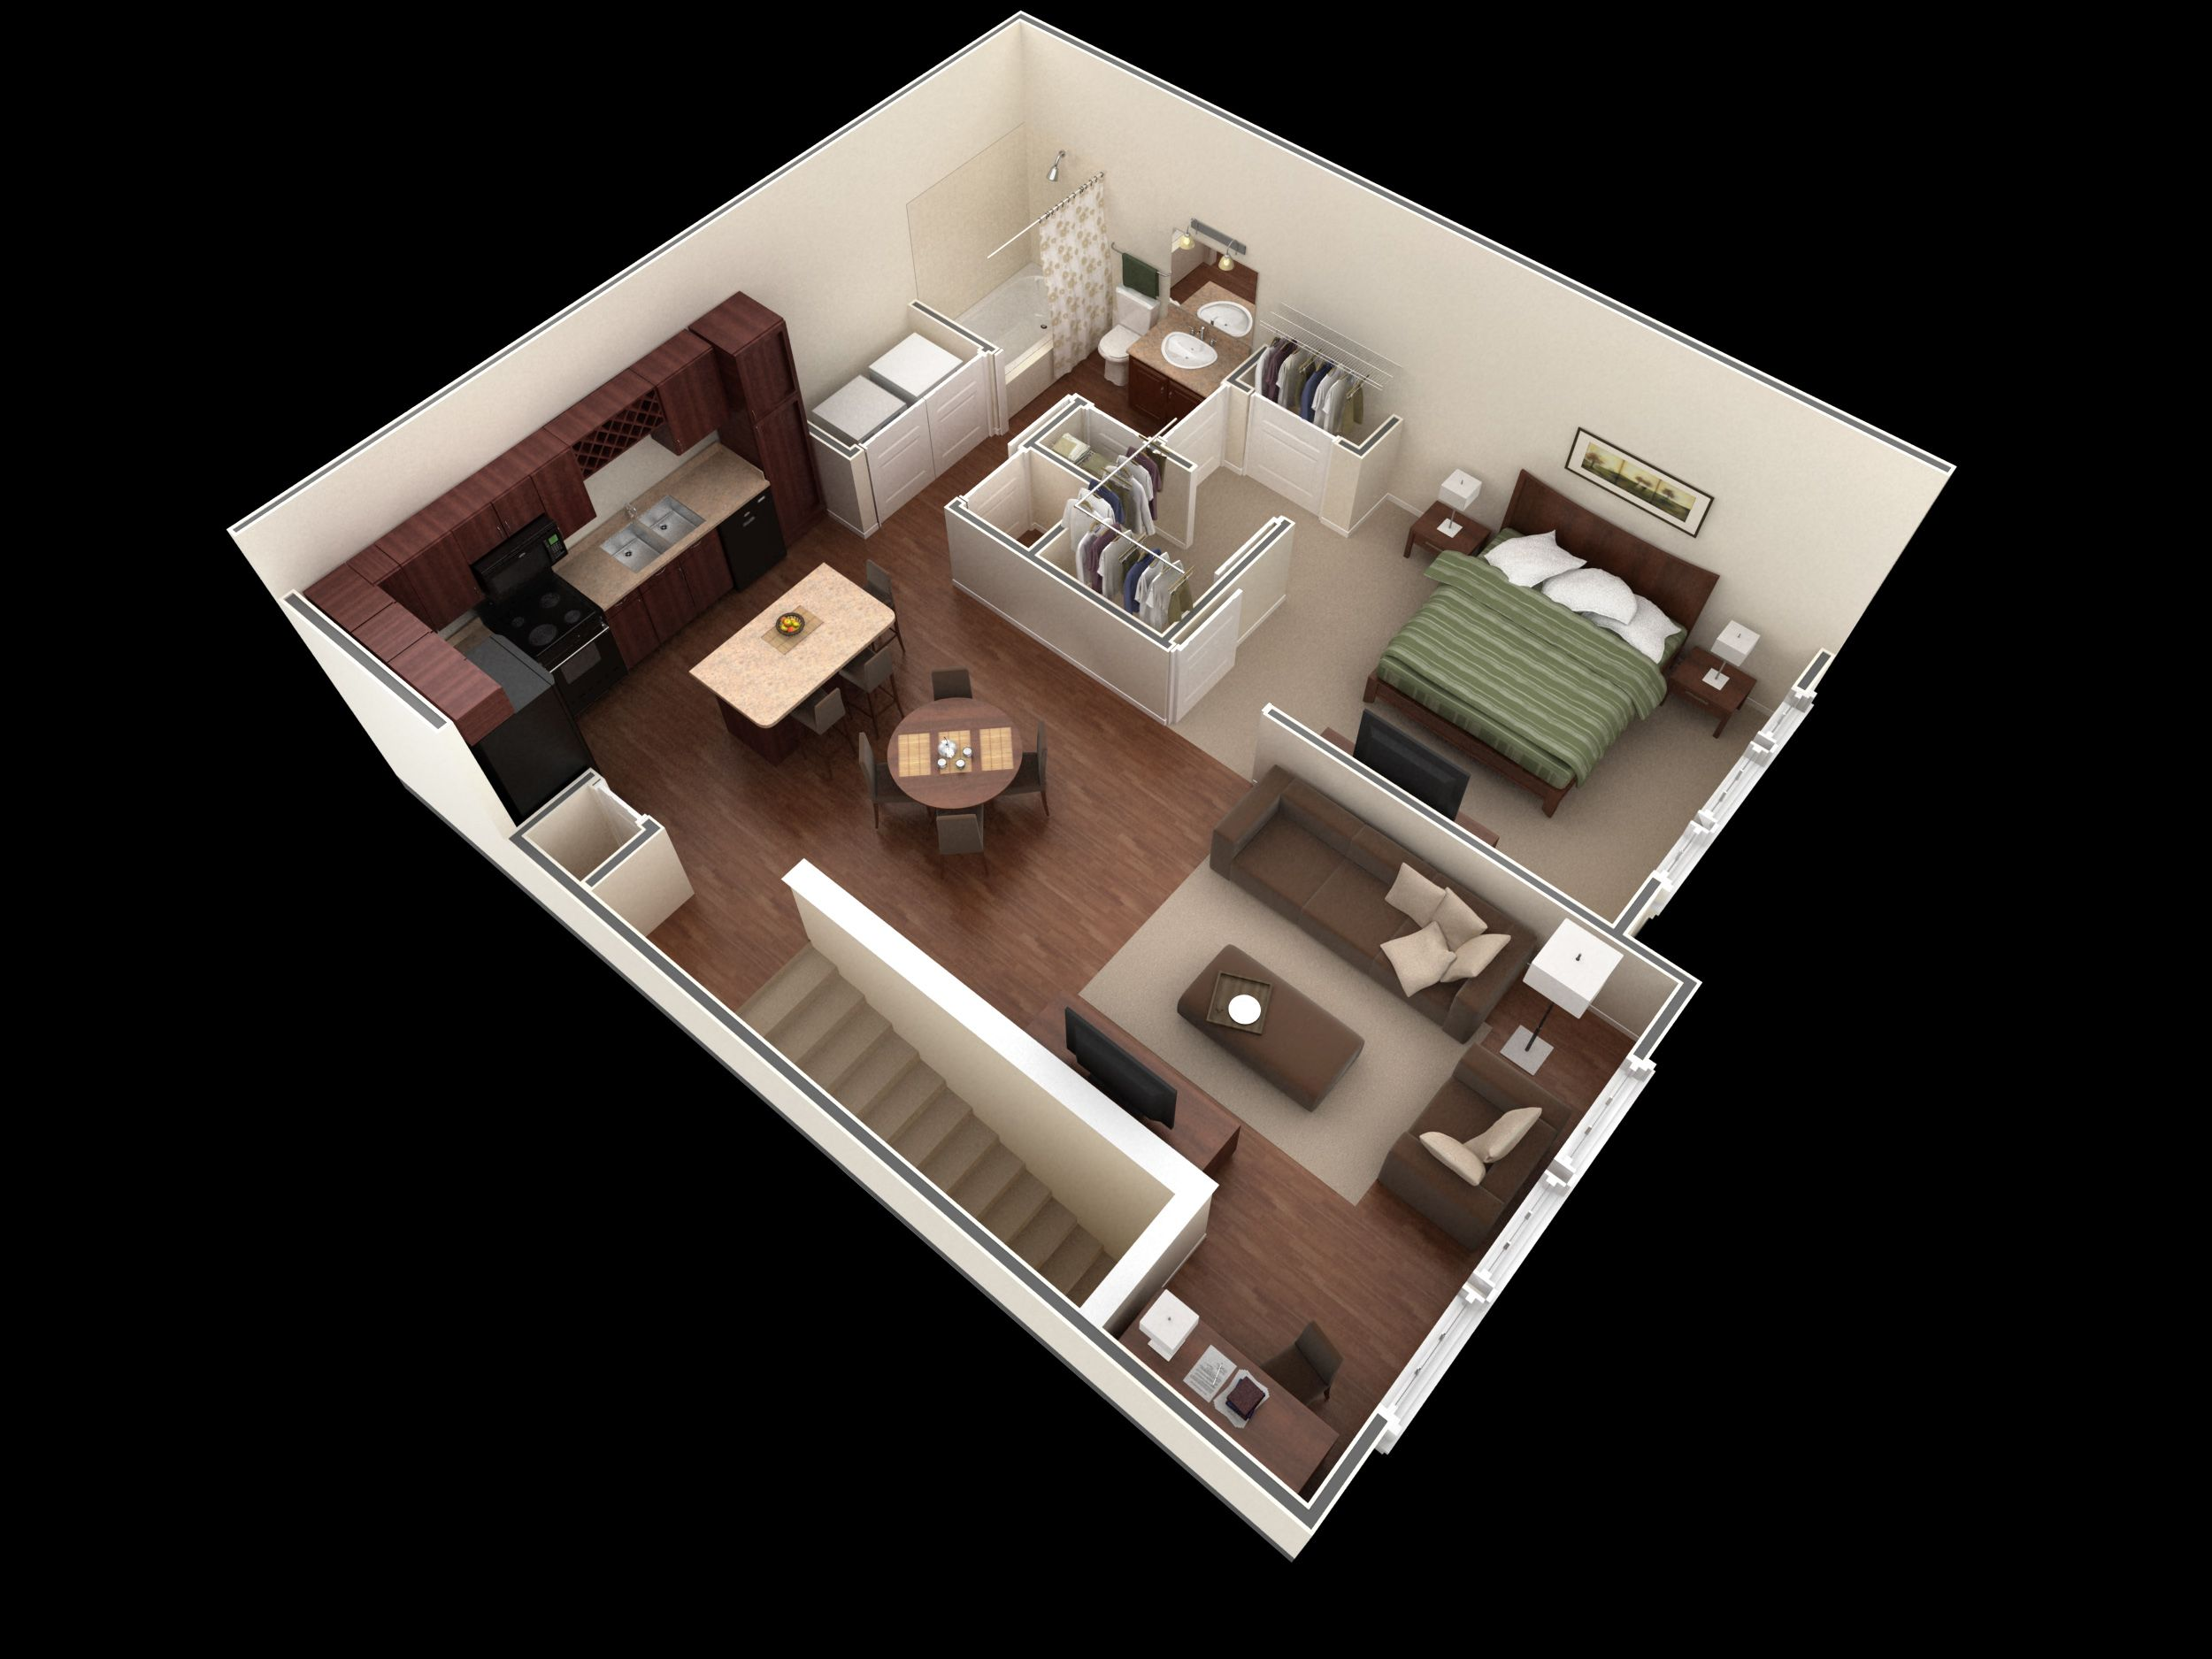 Apartments In Corpus Christi Tx Springs At Corpus Christi One Bedroom House Floor Plan Design Small House Design